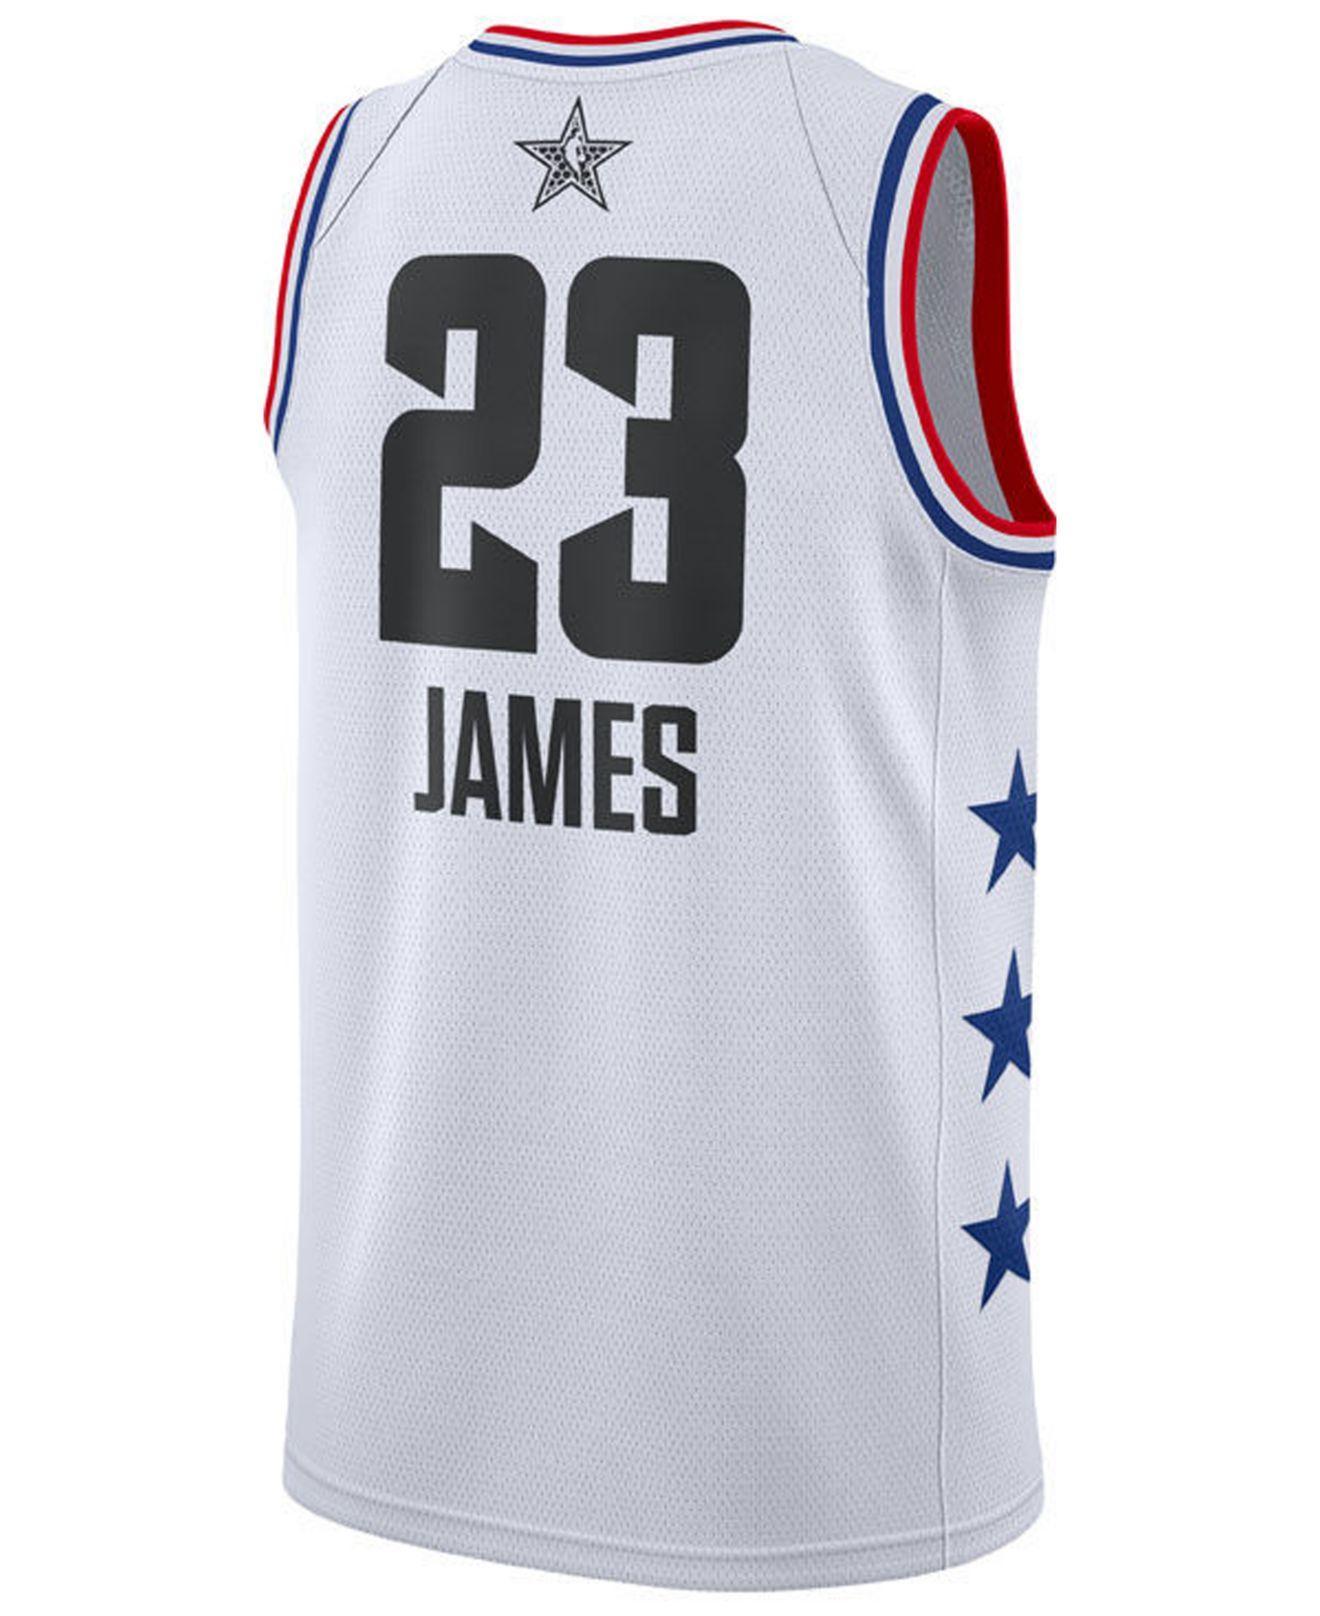 646901552 Lyst - Nike Lebron James Los Angeles Lakers All-star Swingman Jersey in  White for Men